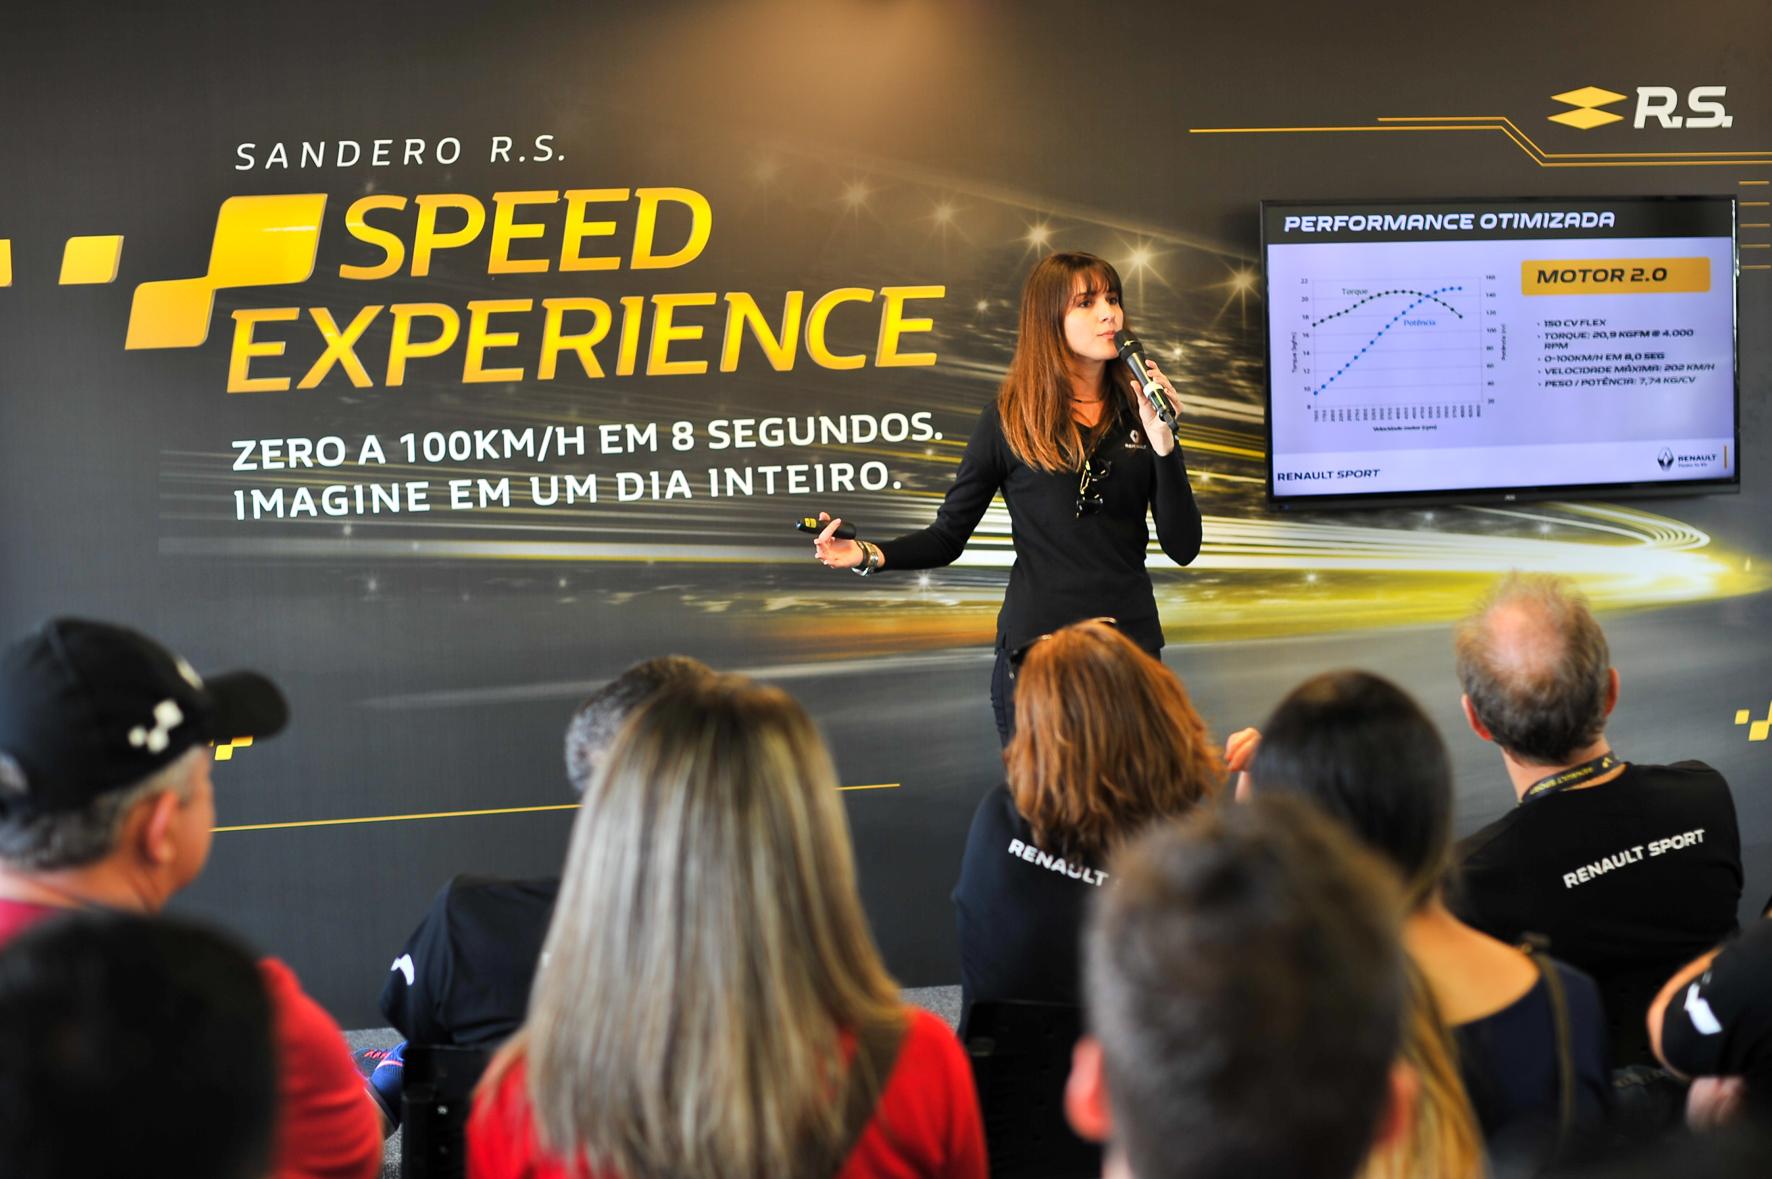 renault_speed_experience_curitiba_by_dudabairros_14551